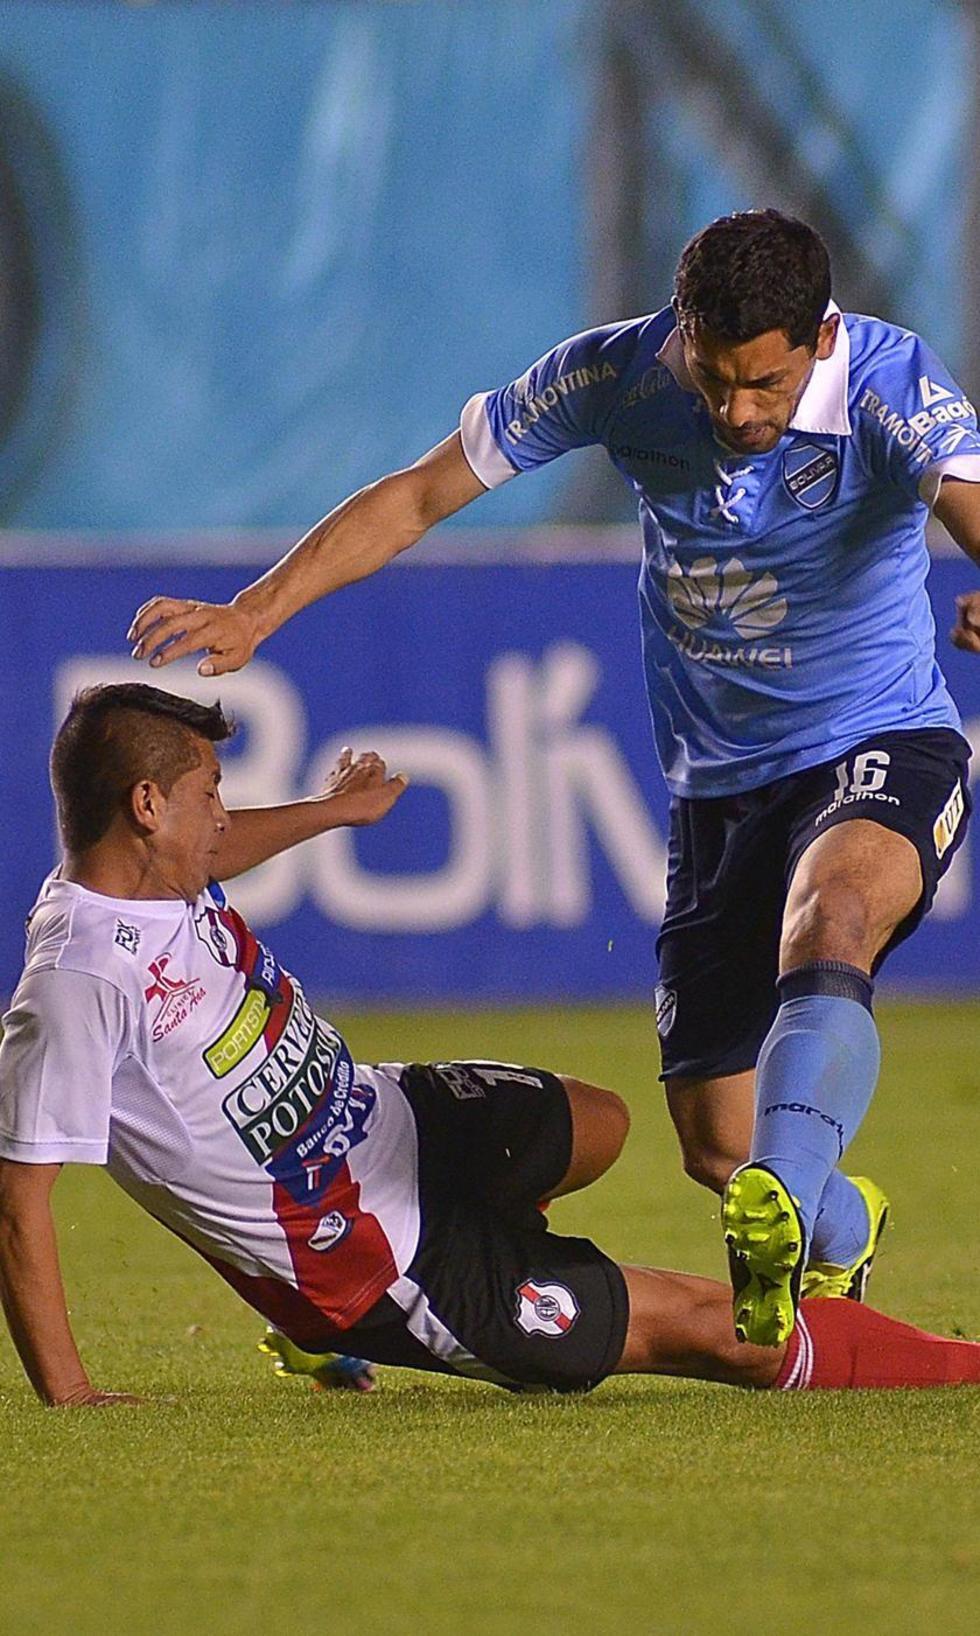 Nacional Potosí cayó ante Bolívar por 6-3 en el Hernando Siles